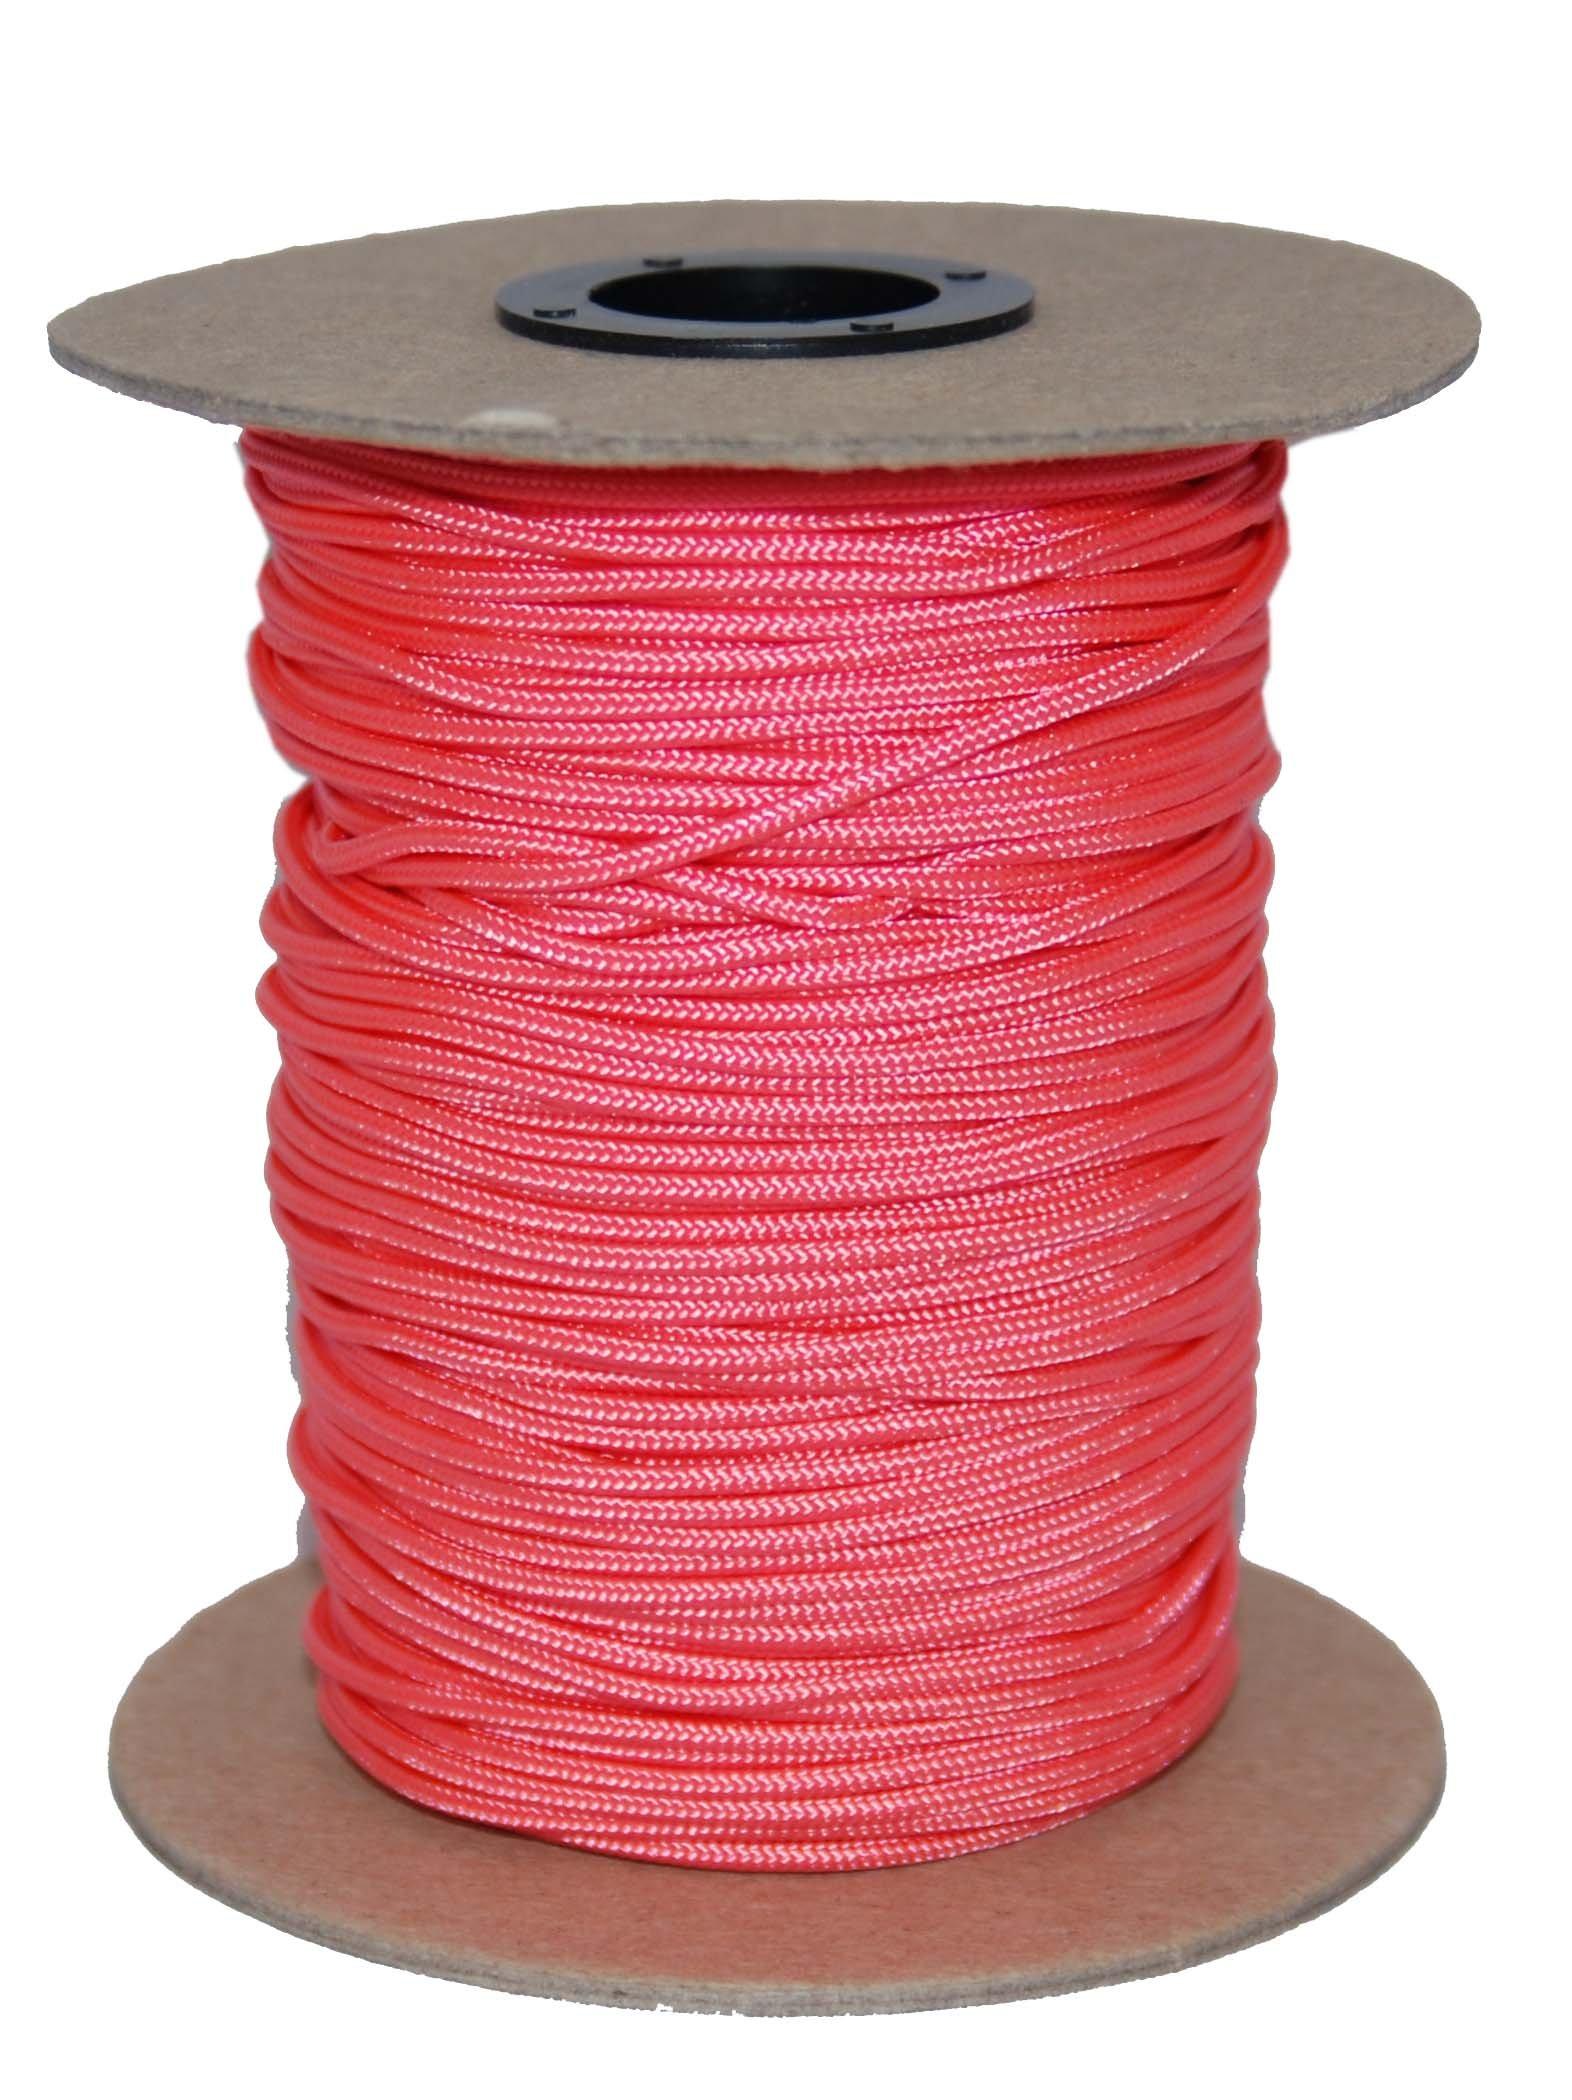 T.W Evans Cordage 70-101PK Crosslace Lacrosse String Spool, 300-Feet, Pink